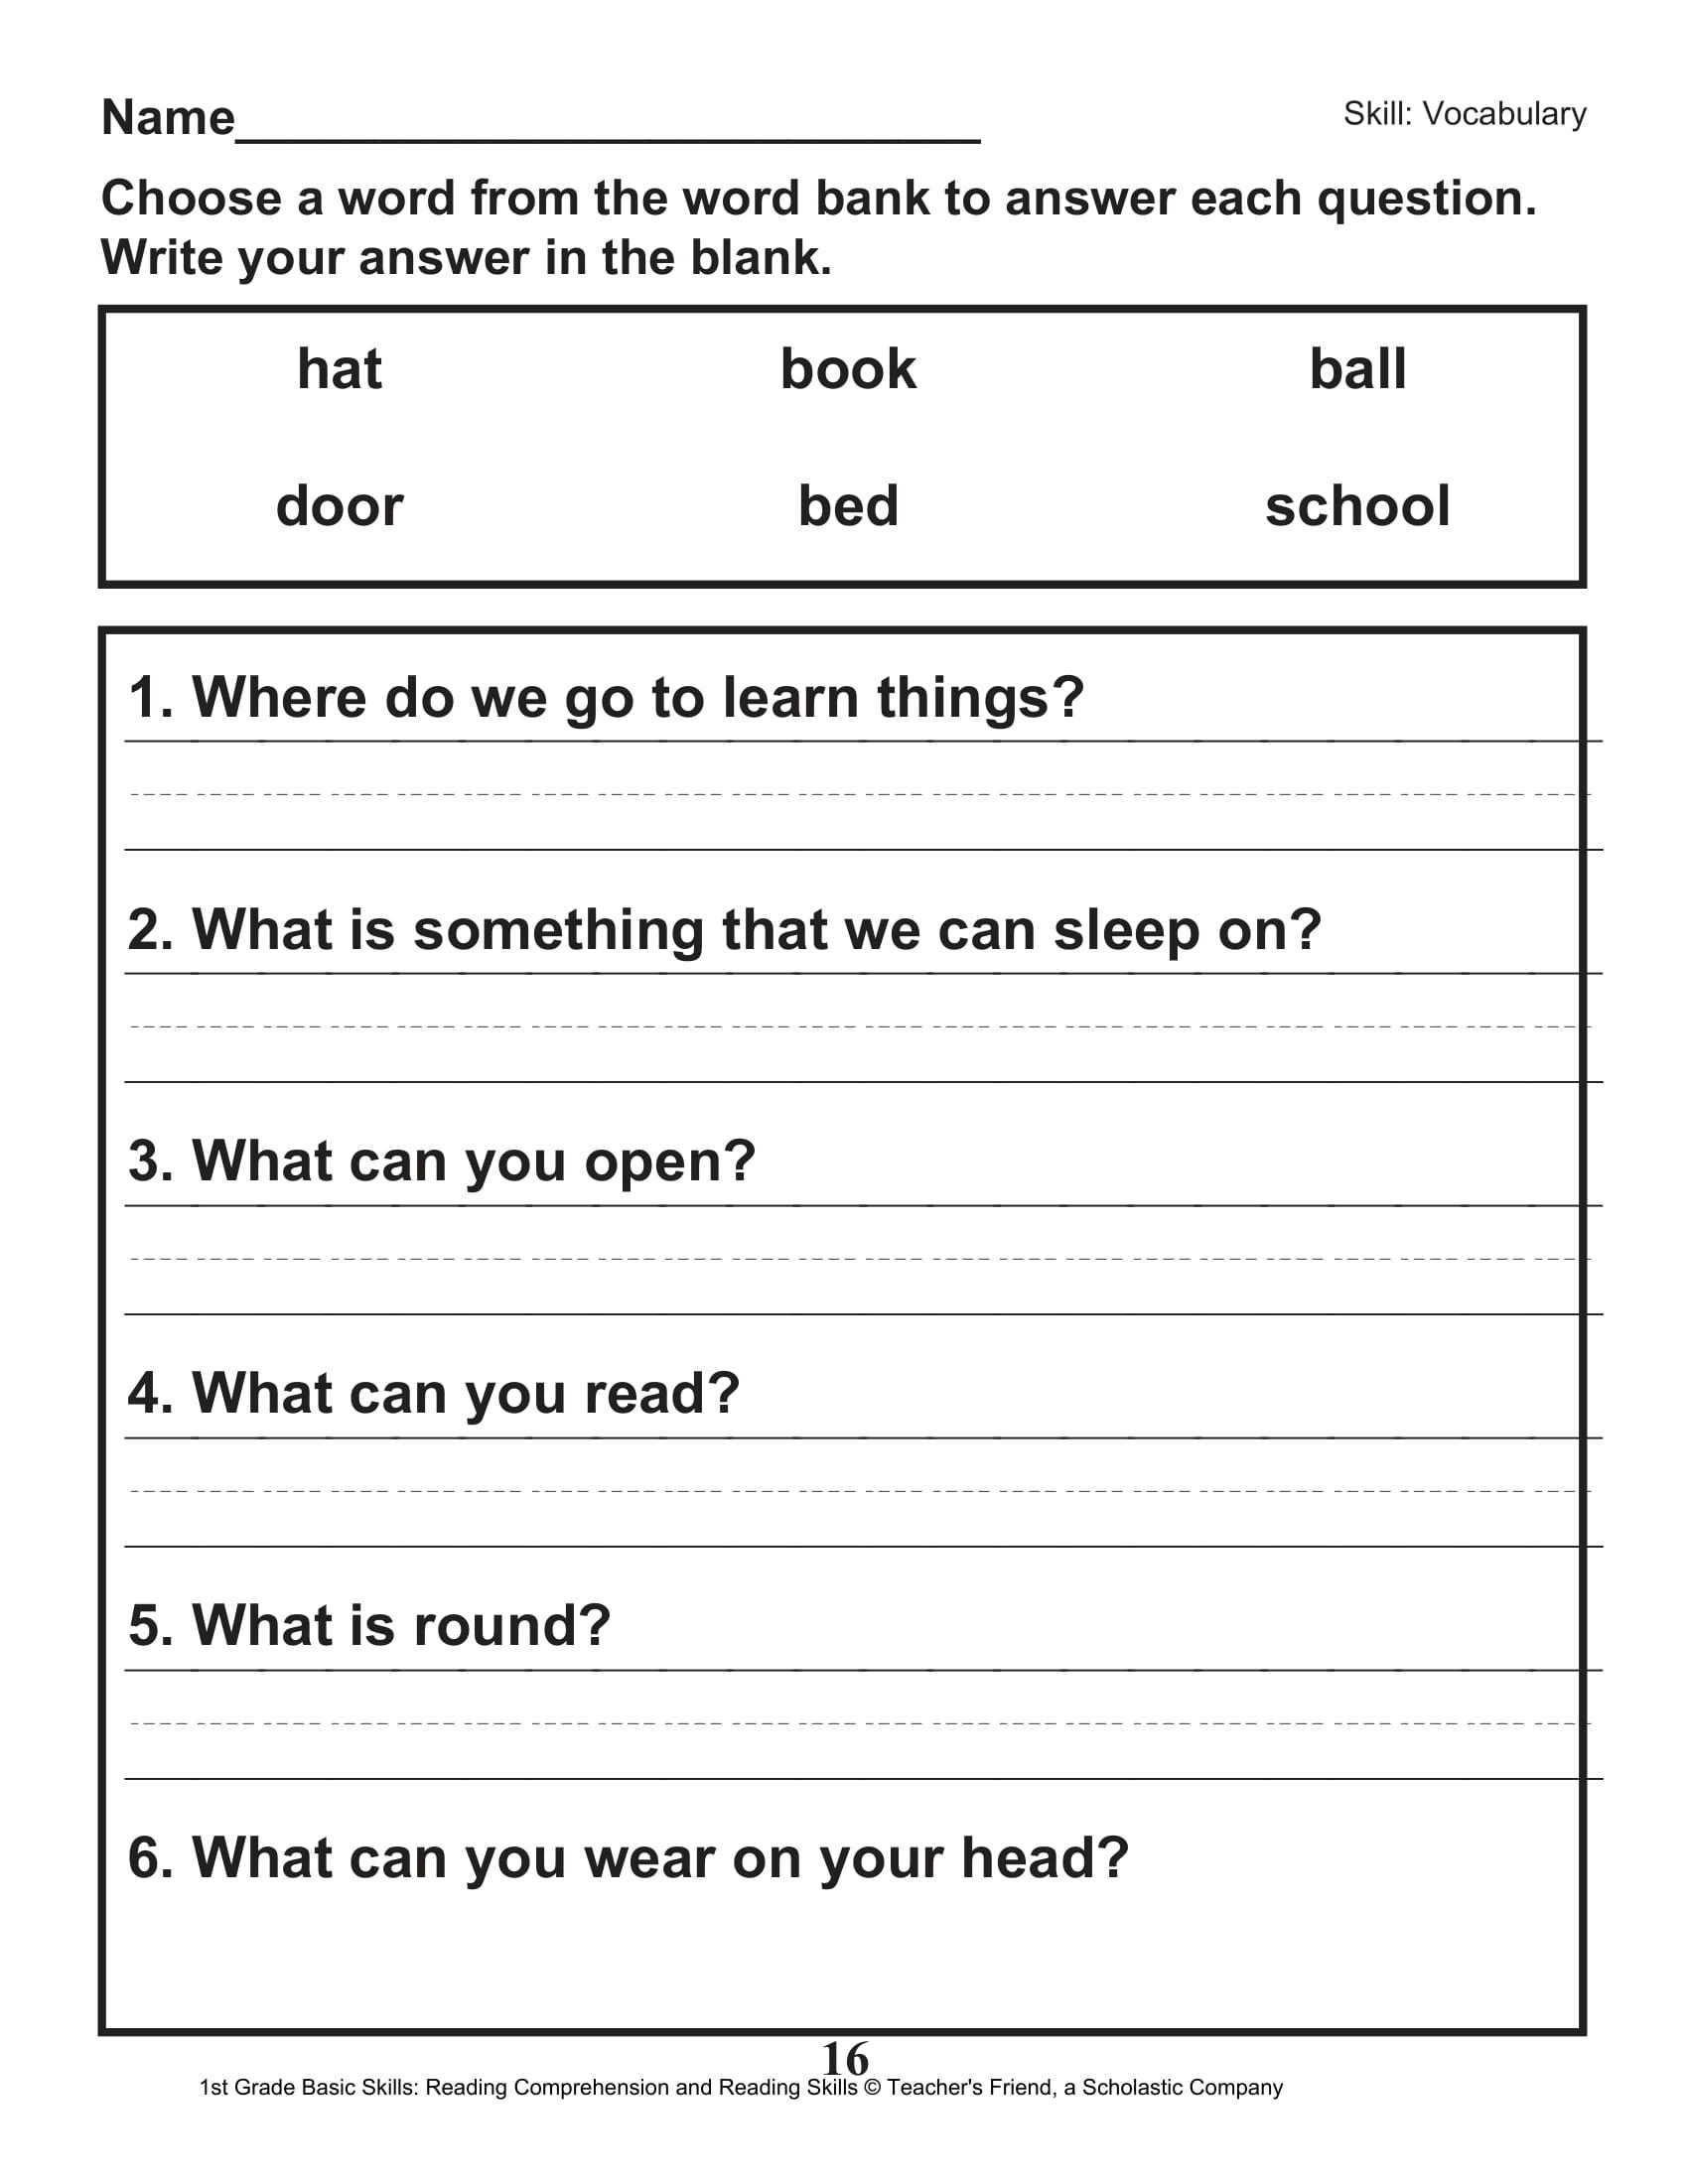 Scholastic 1st Grade Reading Comprehension Skills Worksheets 17